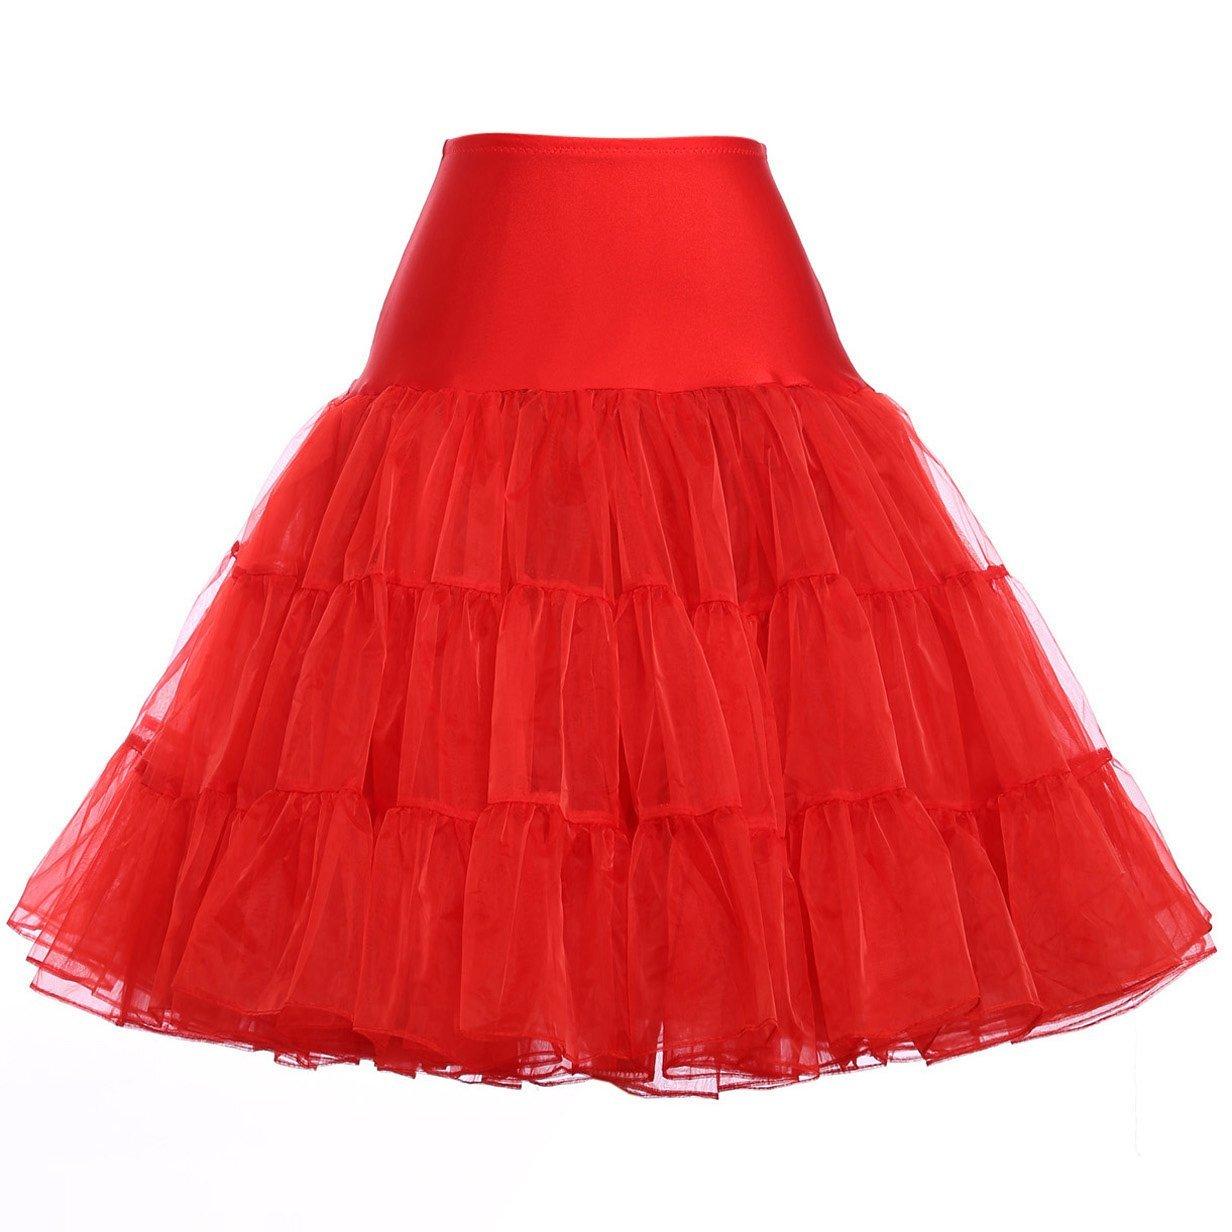 50s Retro Petticoat Vintage Knee Length Crinoline Underskirts Half Slips 12Colors